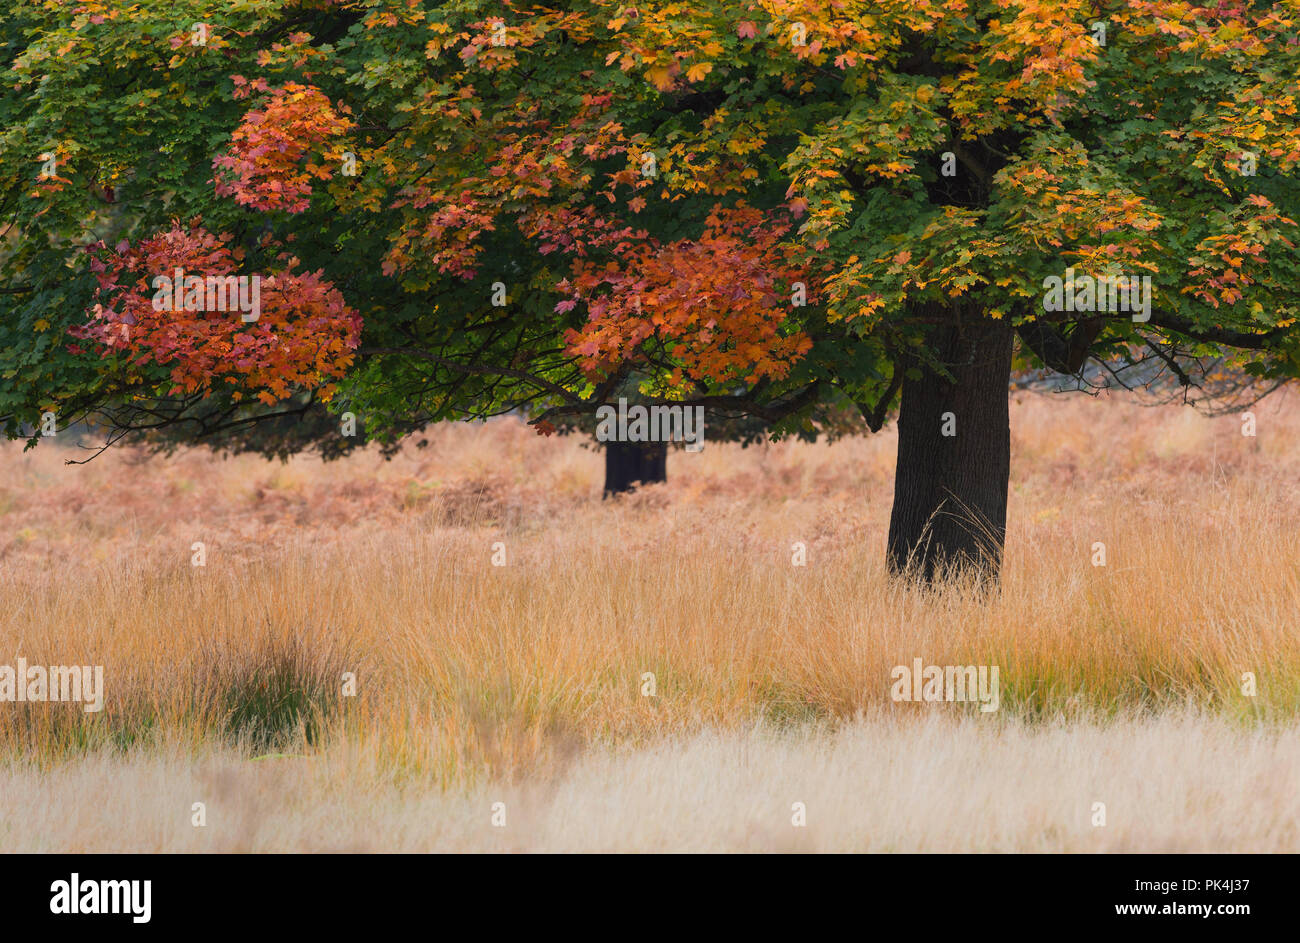 Autumn Trees Landscape Richmond Park UK Stock Photo